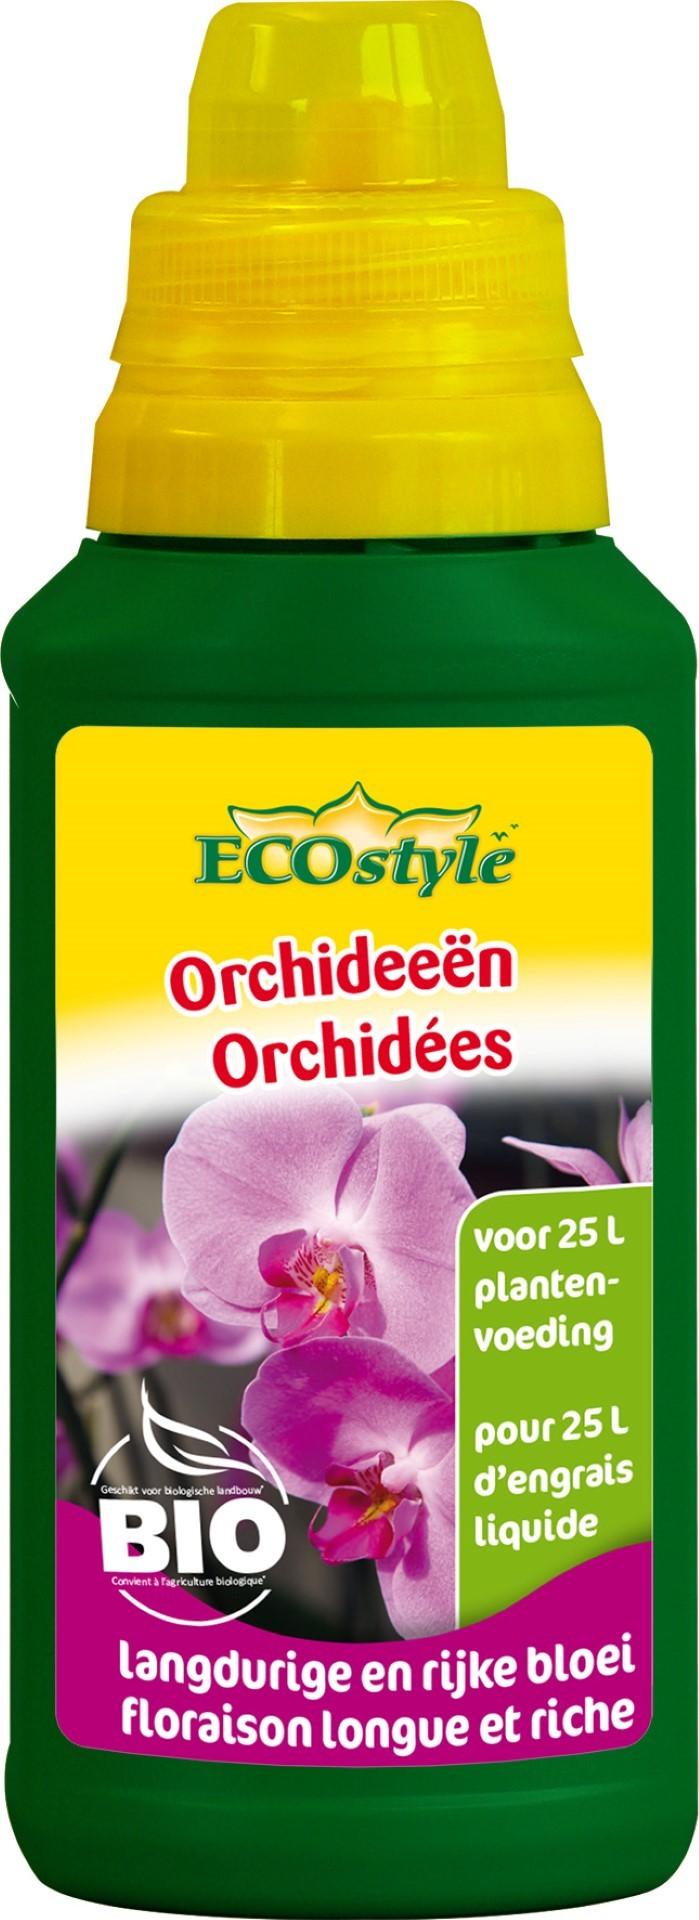 Orchideeen plantenvoeding